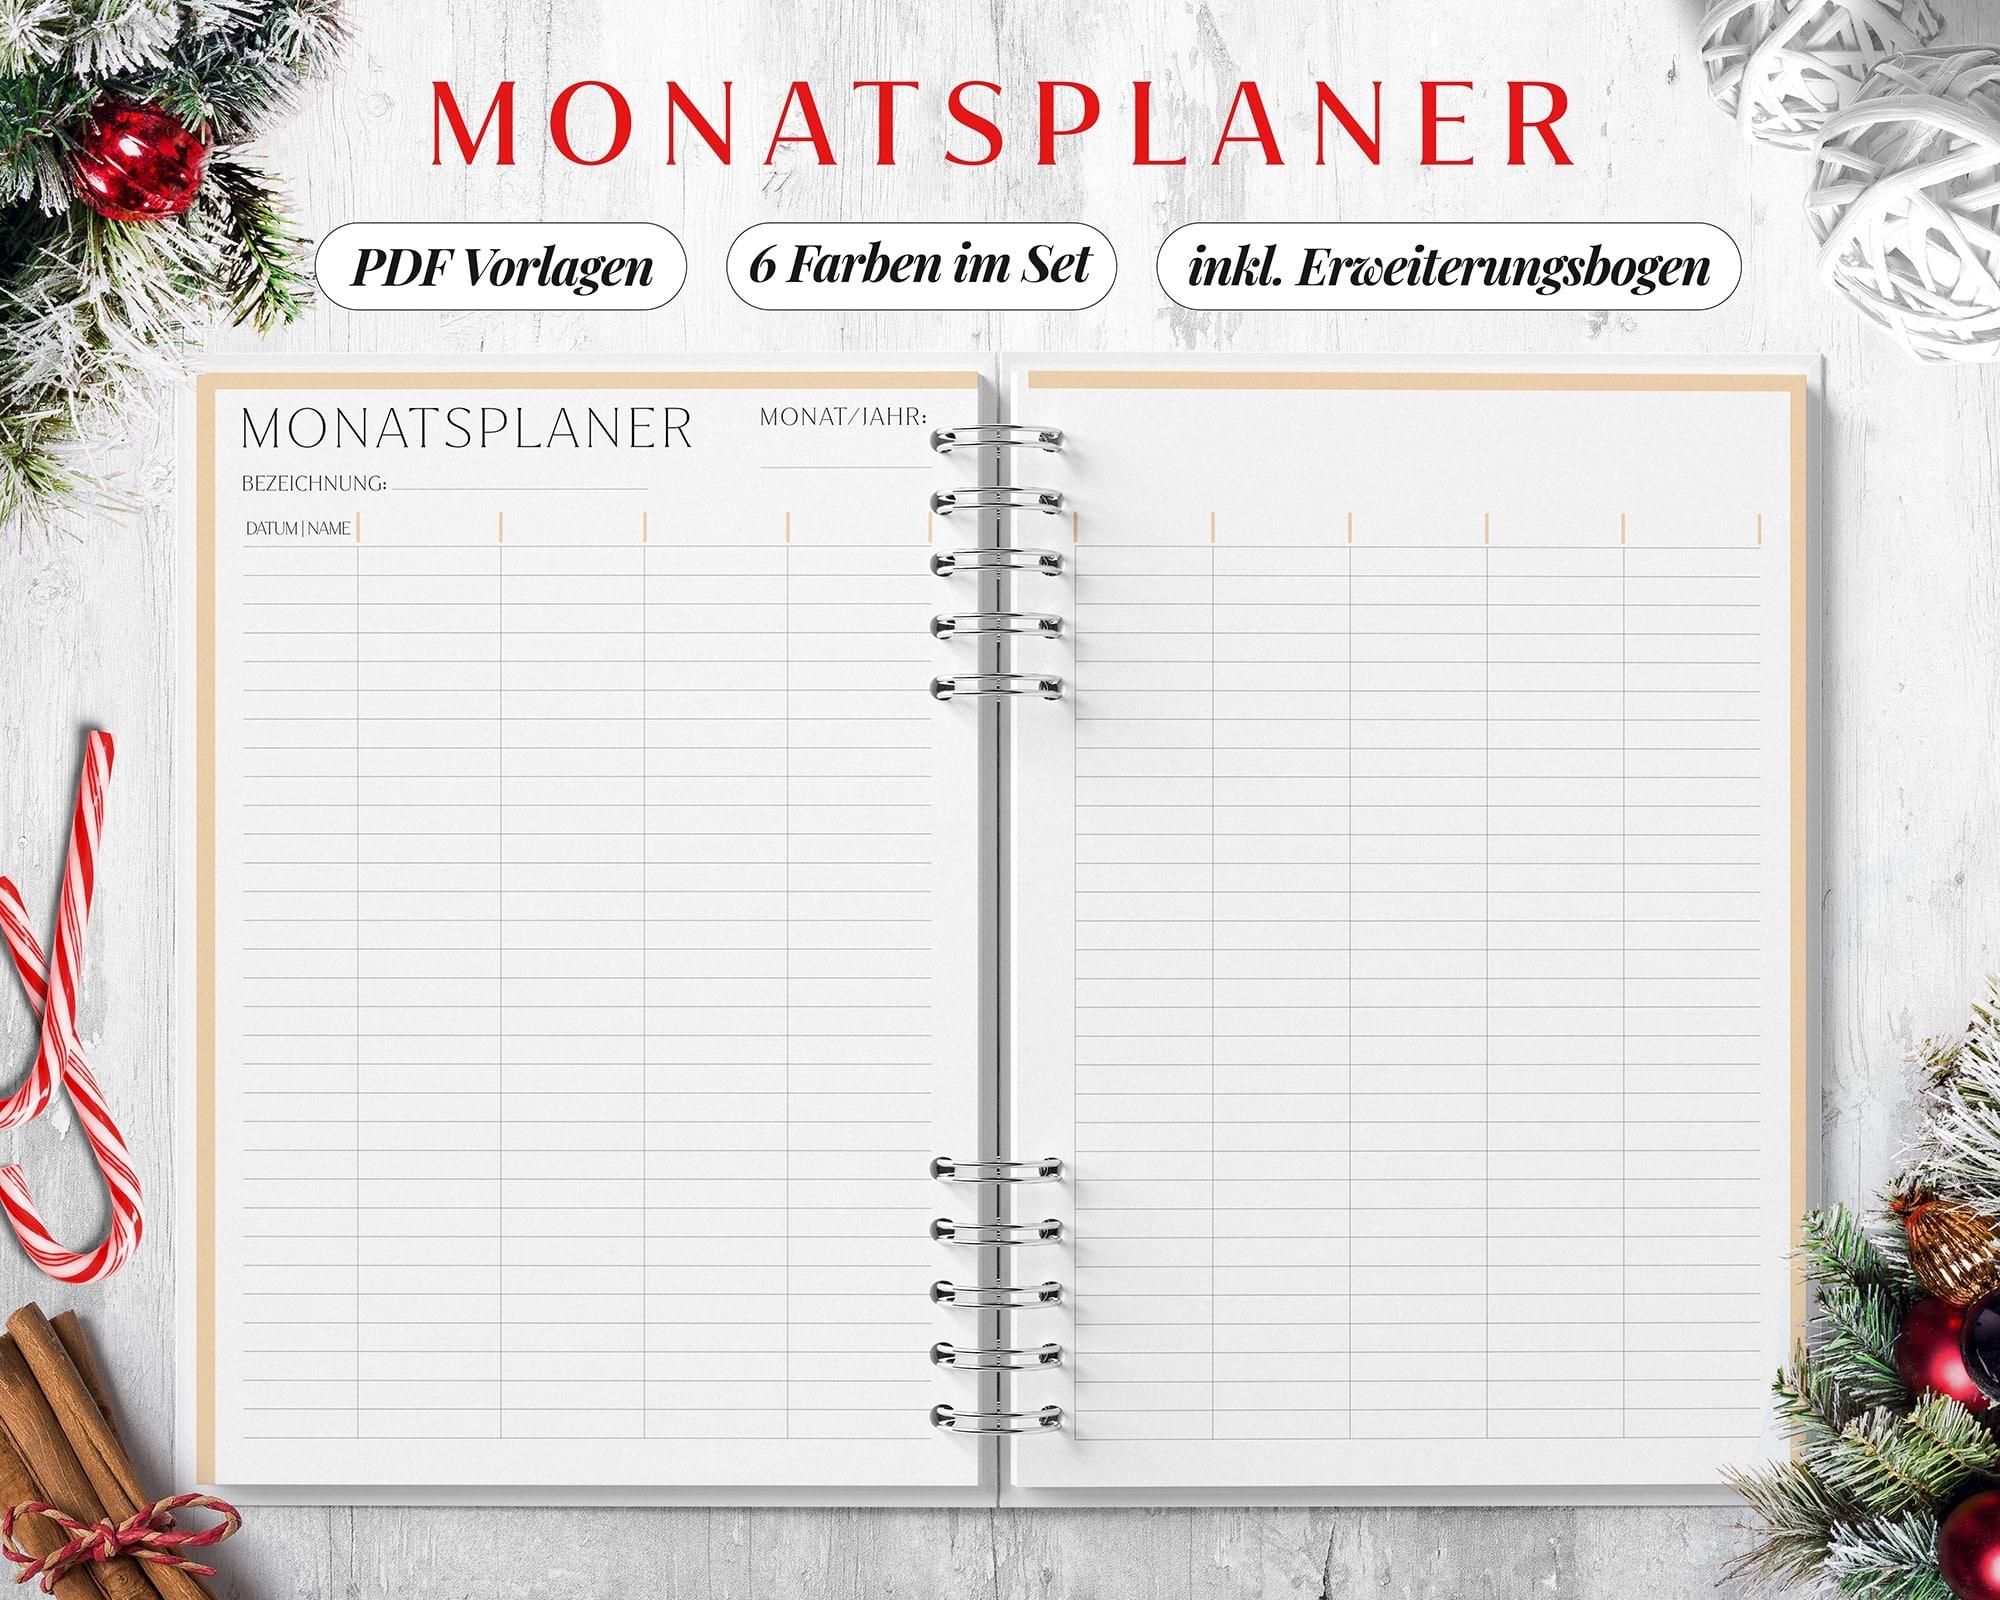 Monatsplaner digital doppelseitig pdf